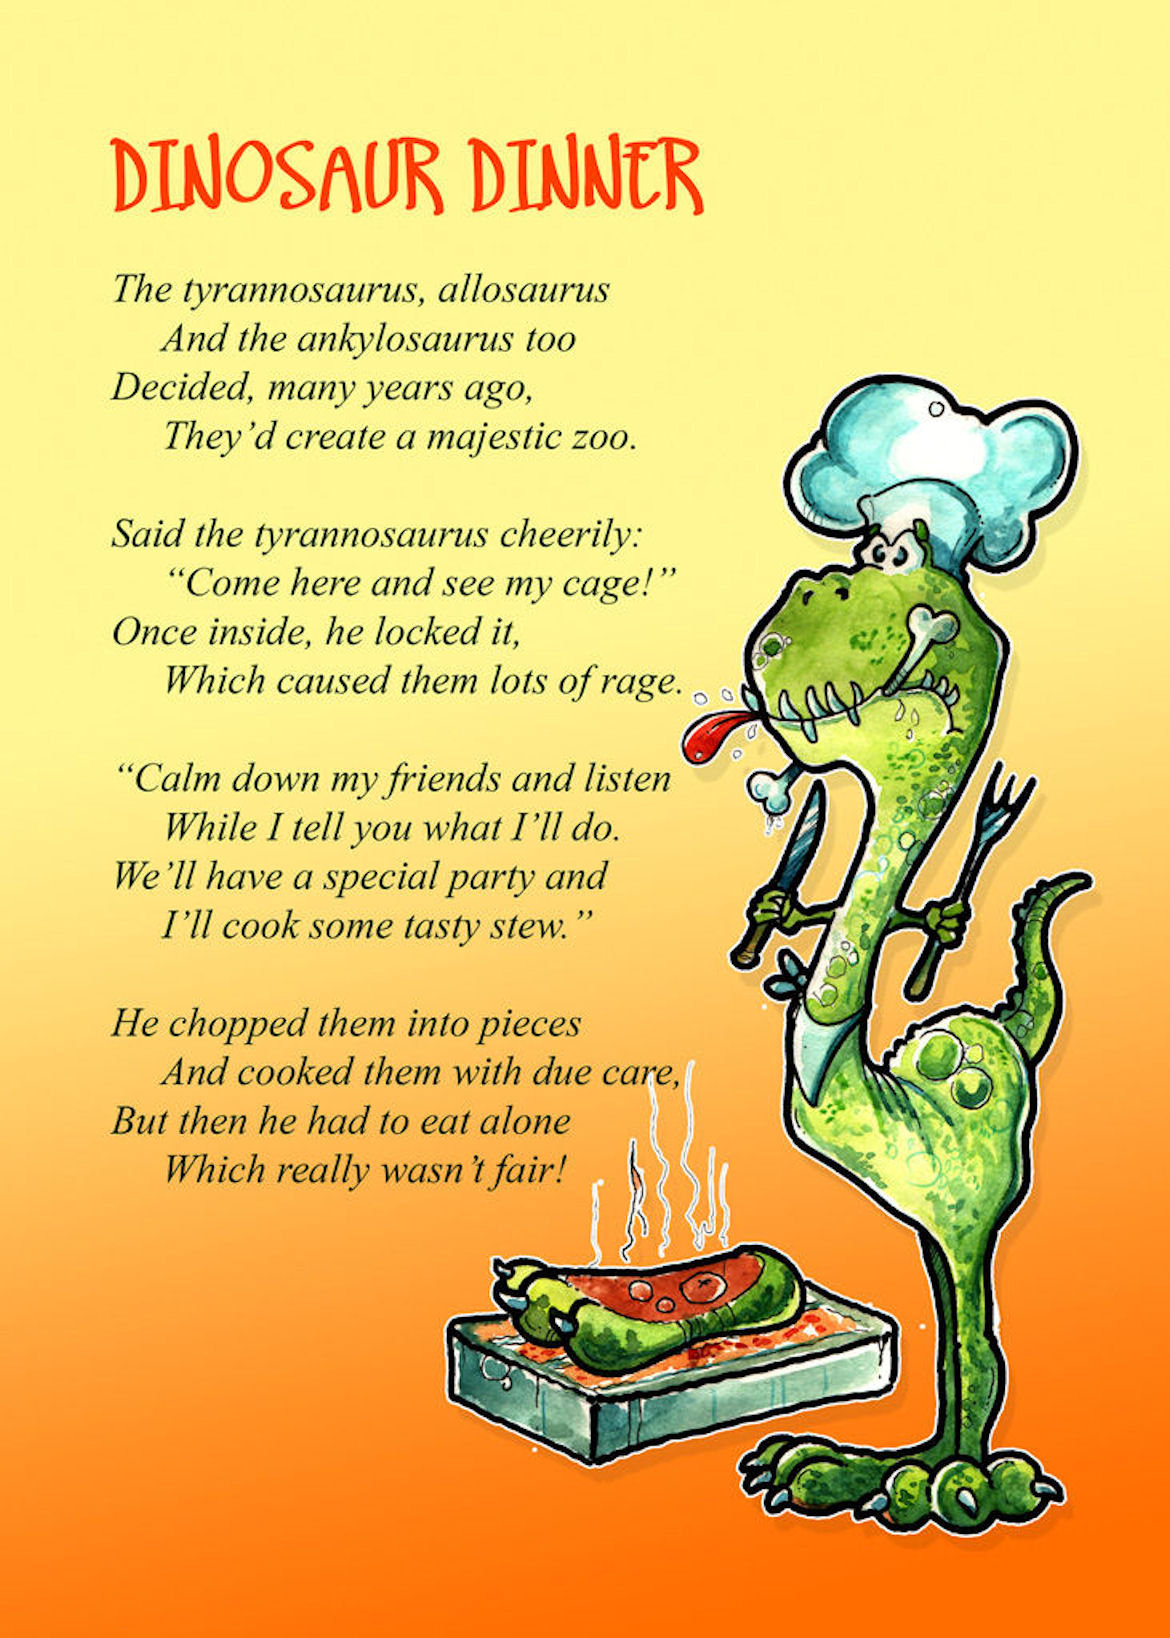 Louis Perez - Dinosaur Dinner.jpg